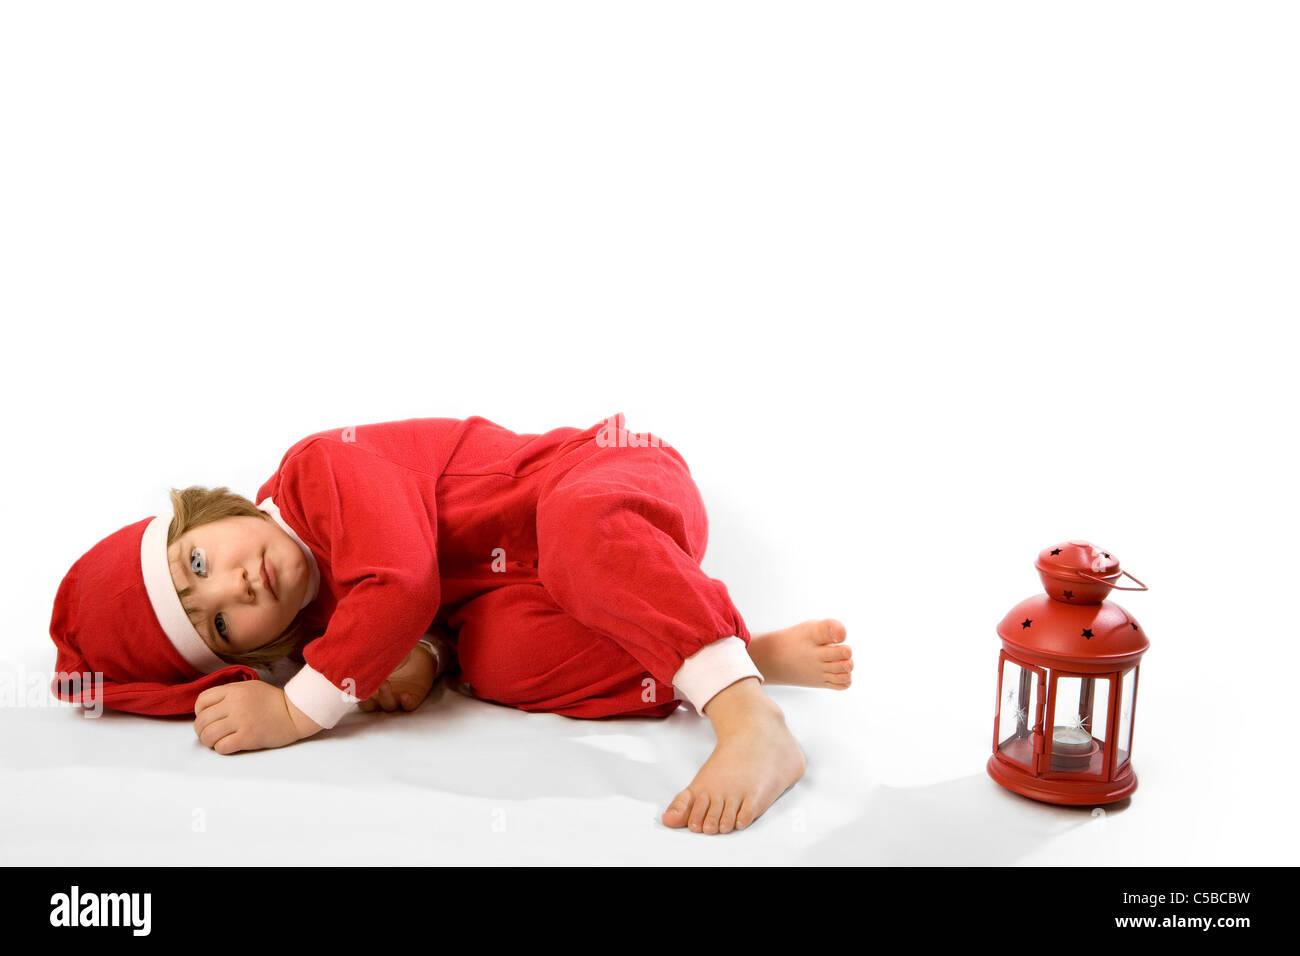 Santa girl resting on floor besides a red lantern over white background - Stock Image